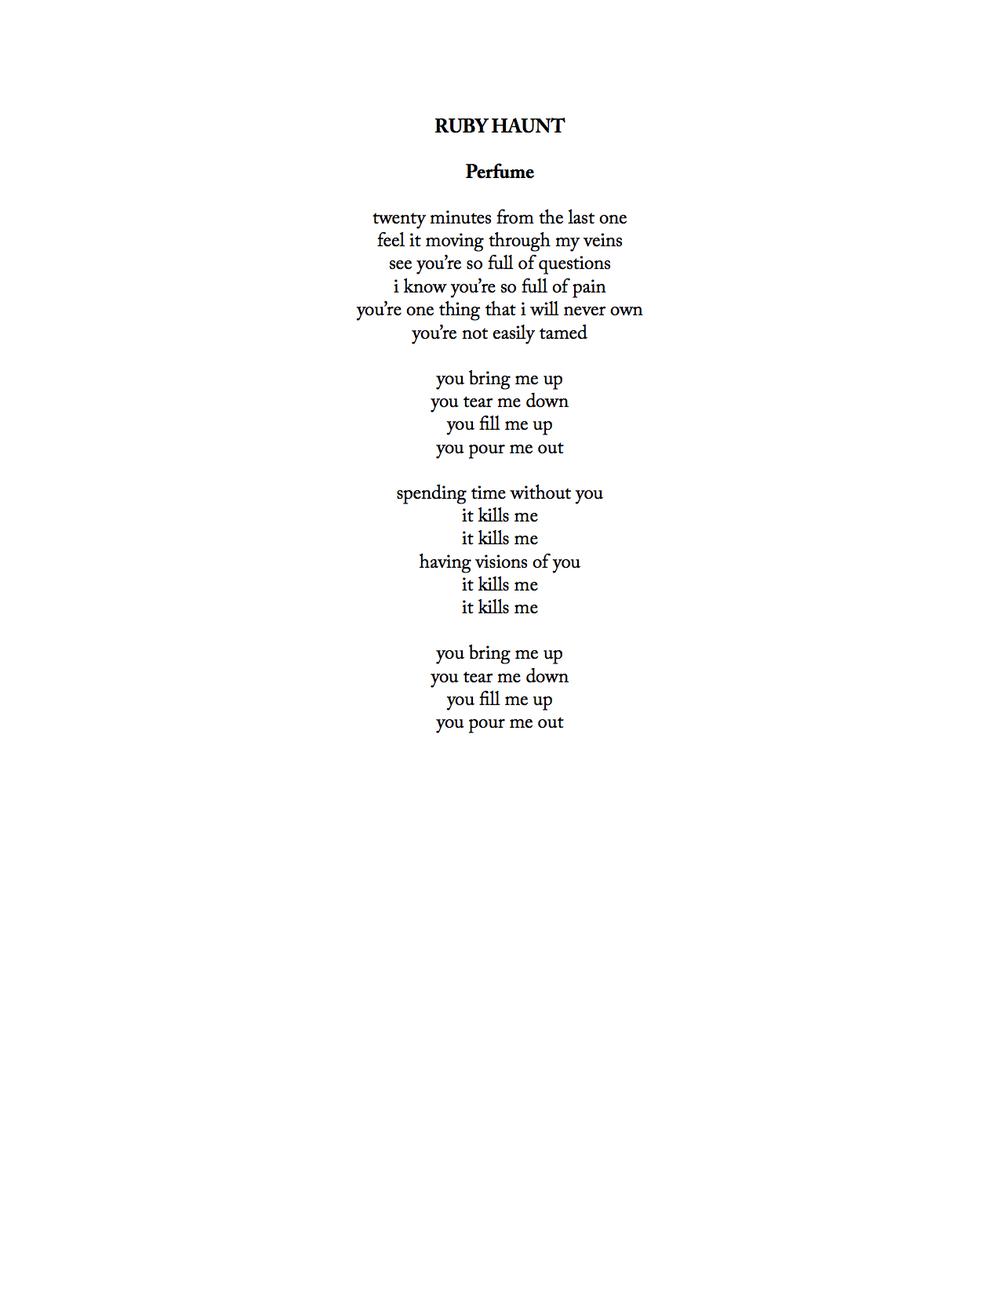 ruby haunt - perfume